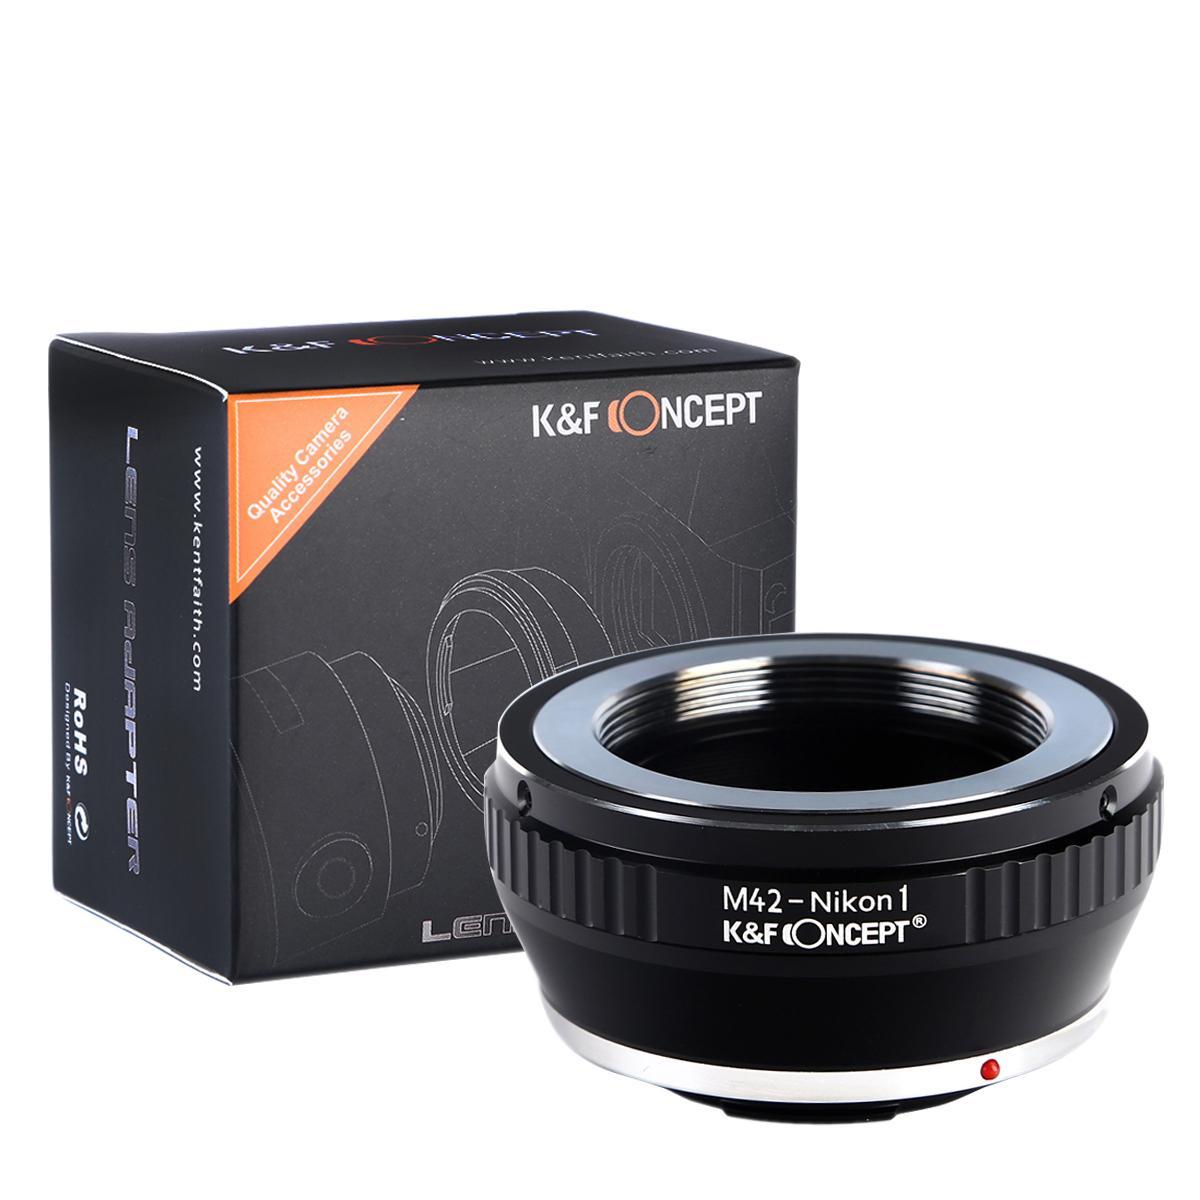 K&F M10201 M42 Lenses to Nikon 1 Lens Mount Adapter